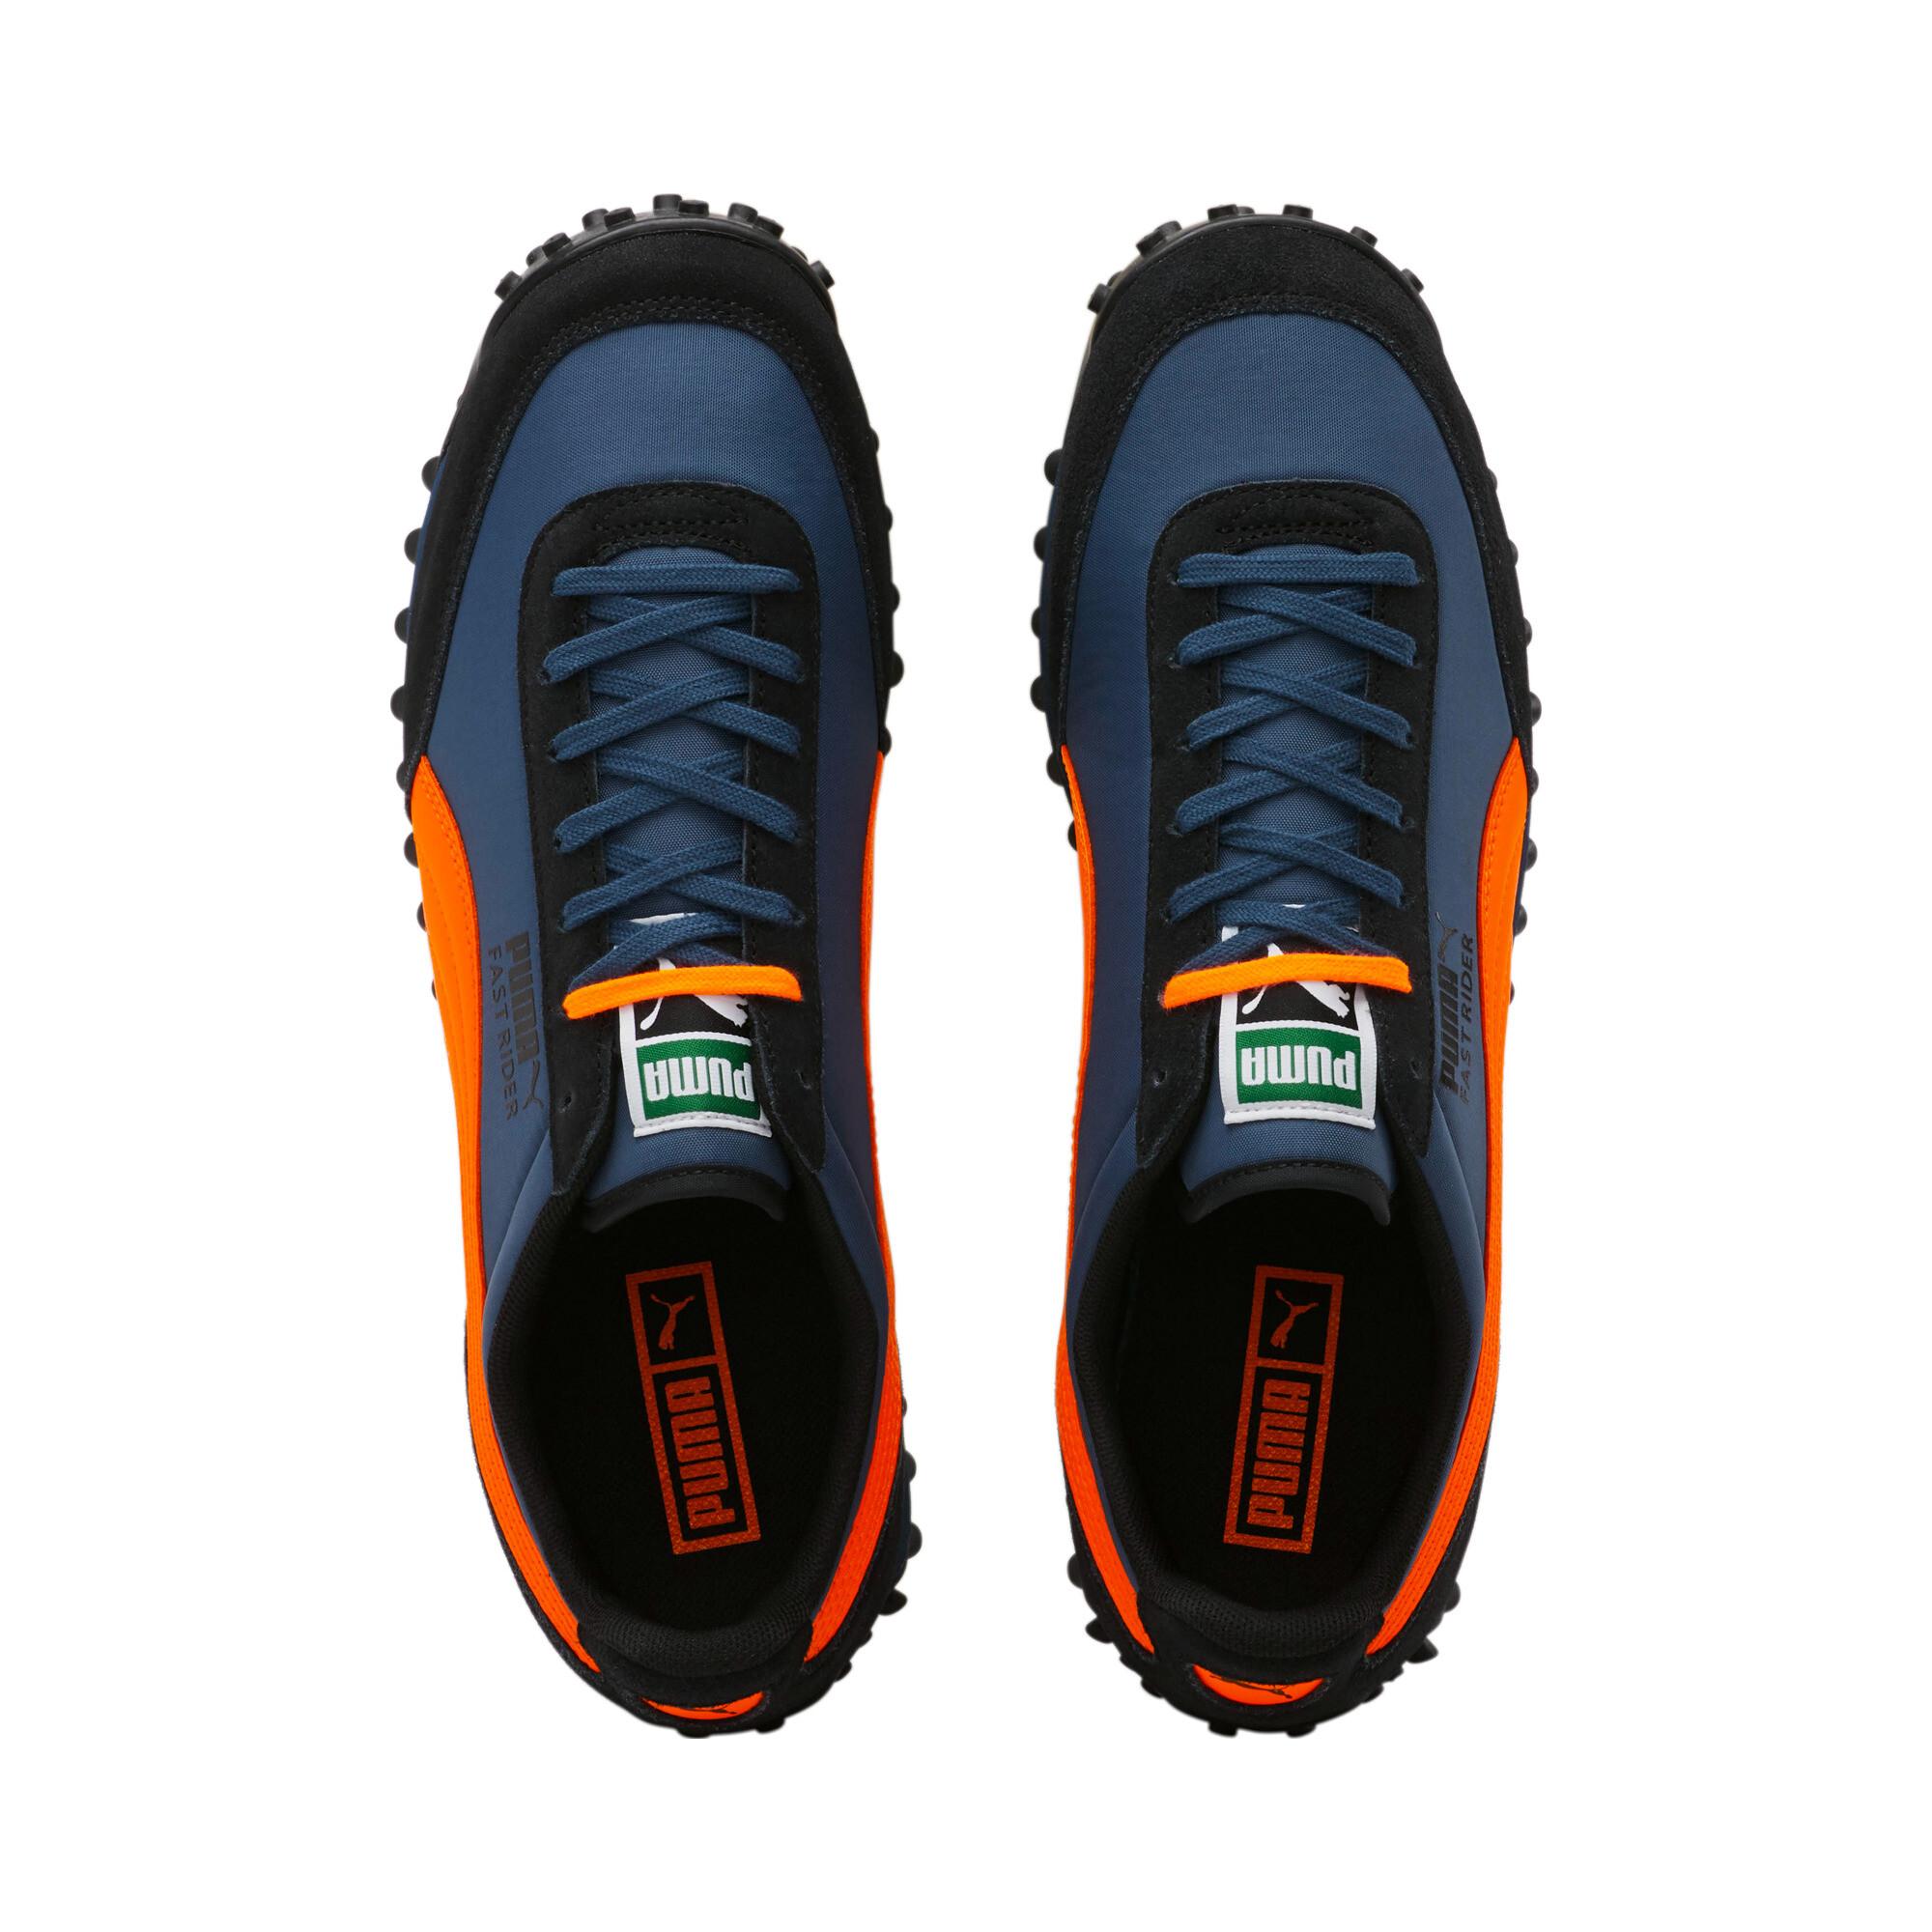 PUMA-Men-039-s-Fast-Rider-Source-Sneakers thumbnail 21